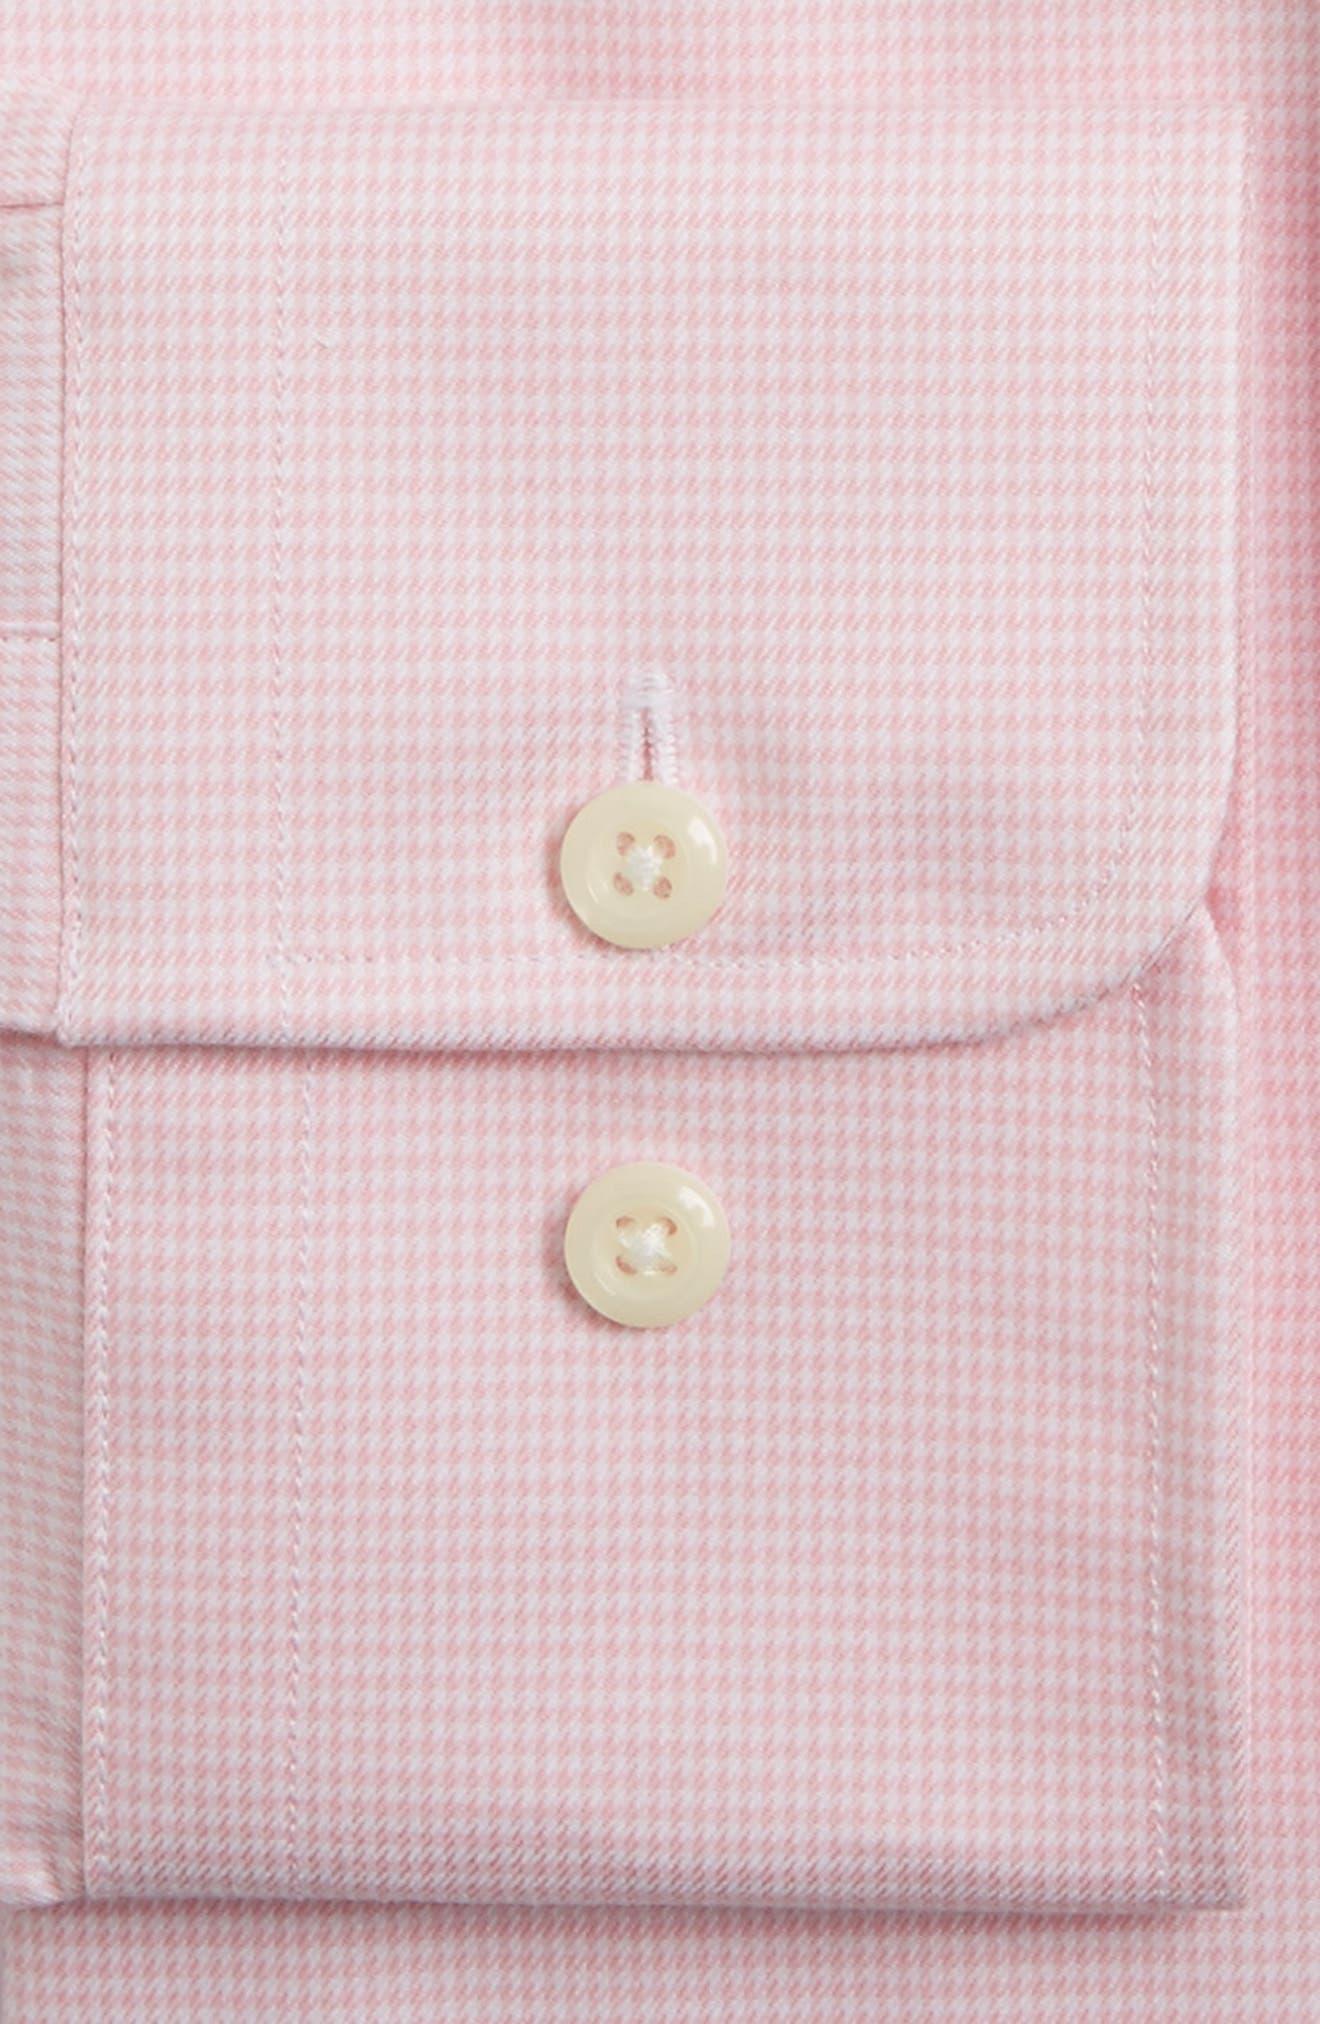 Regular Fit Houndstooth Dress Shirt,                             Alternate thumbnail 3, color,                             650